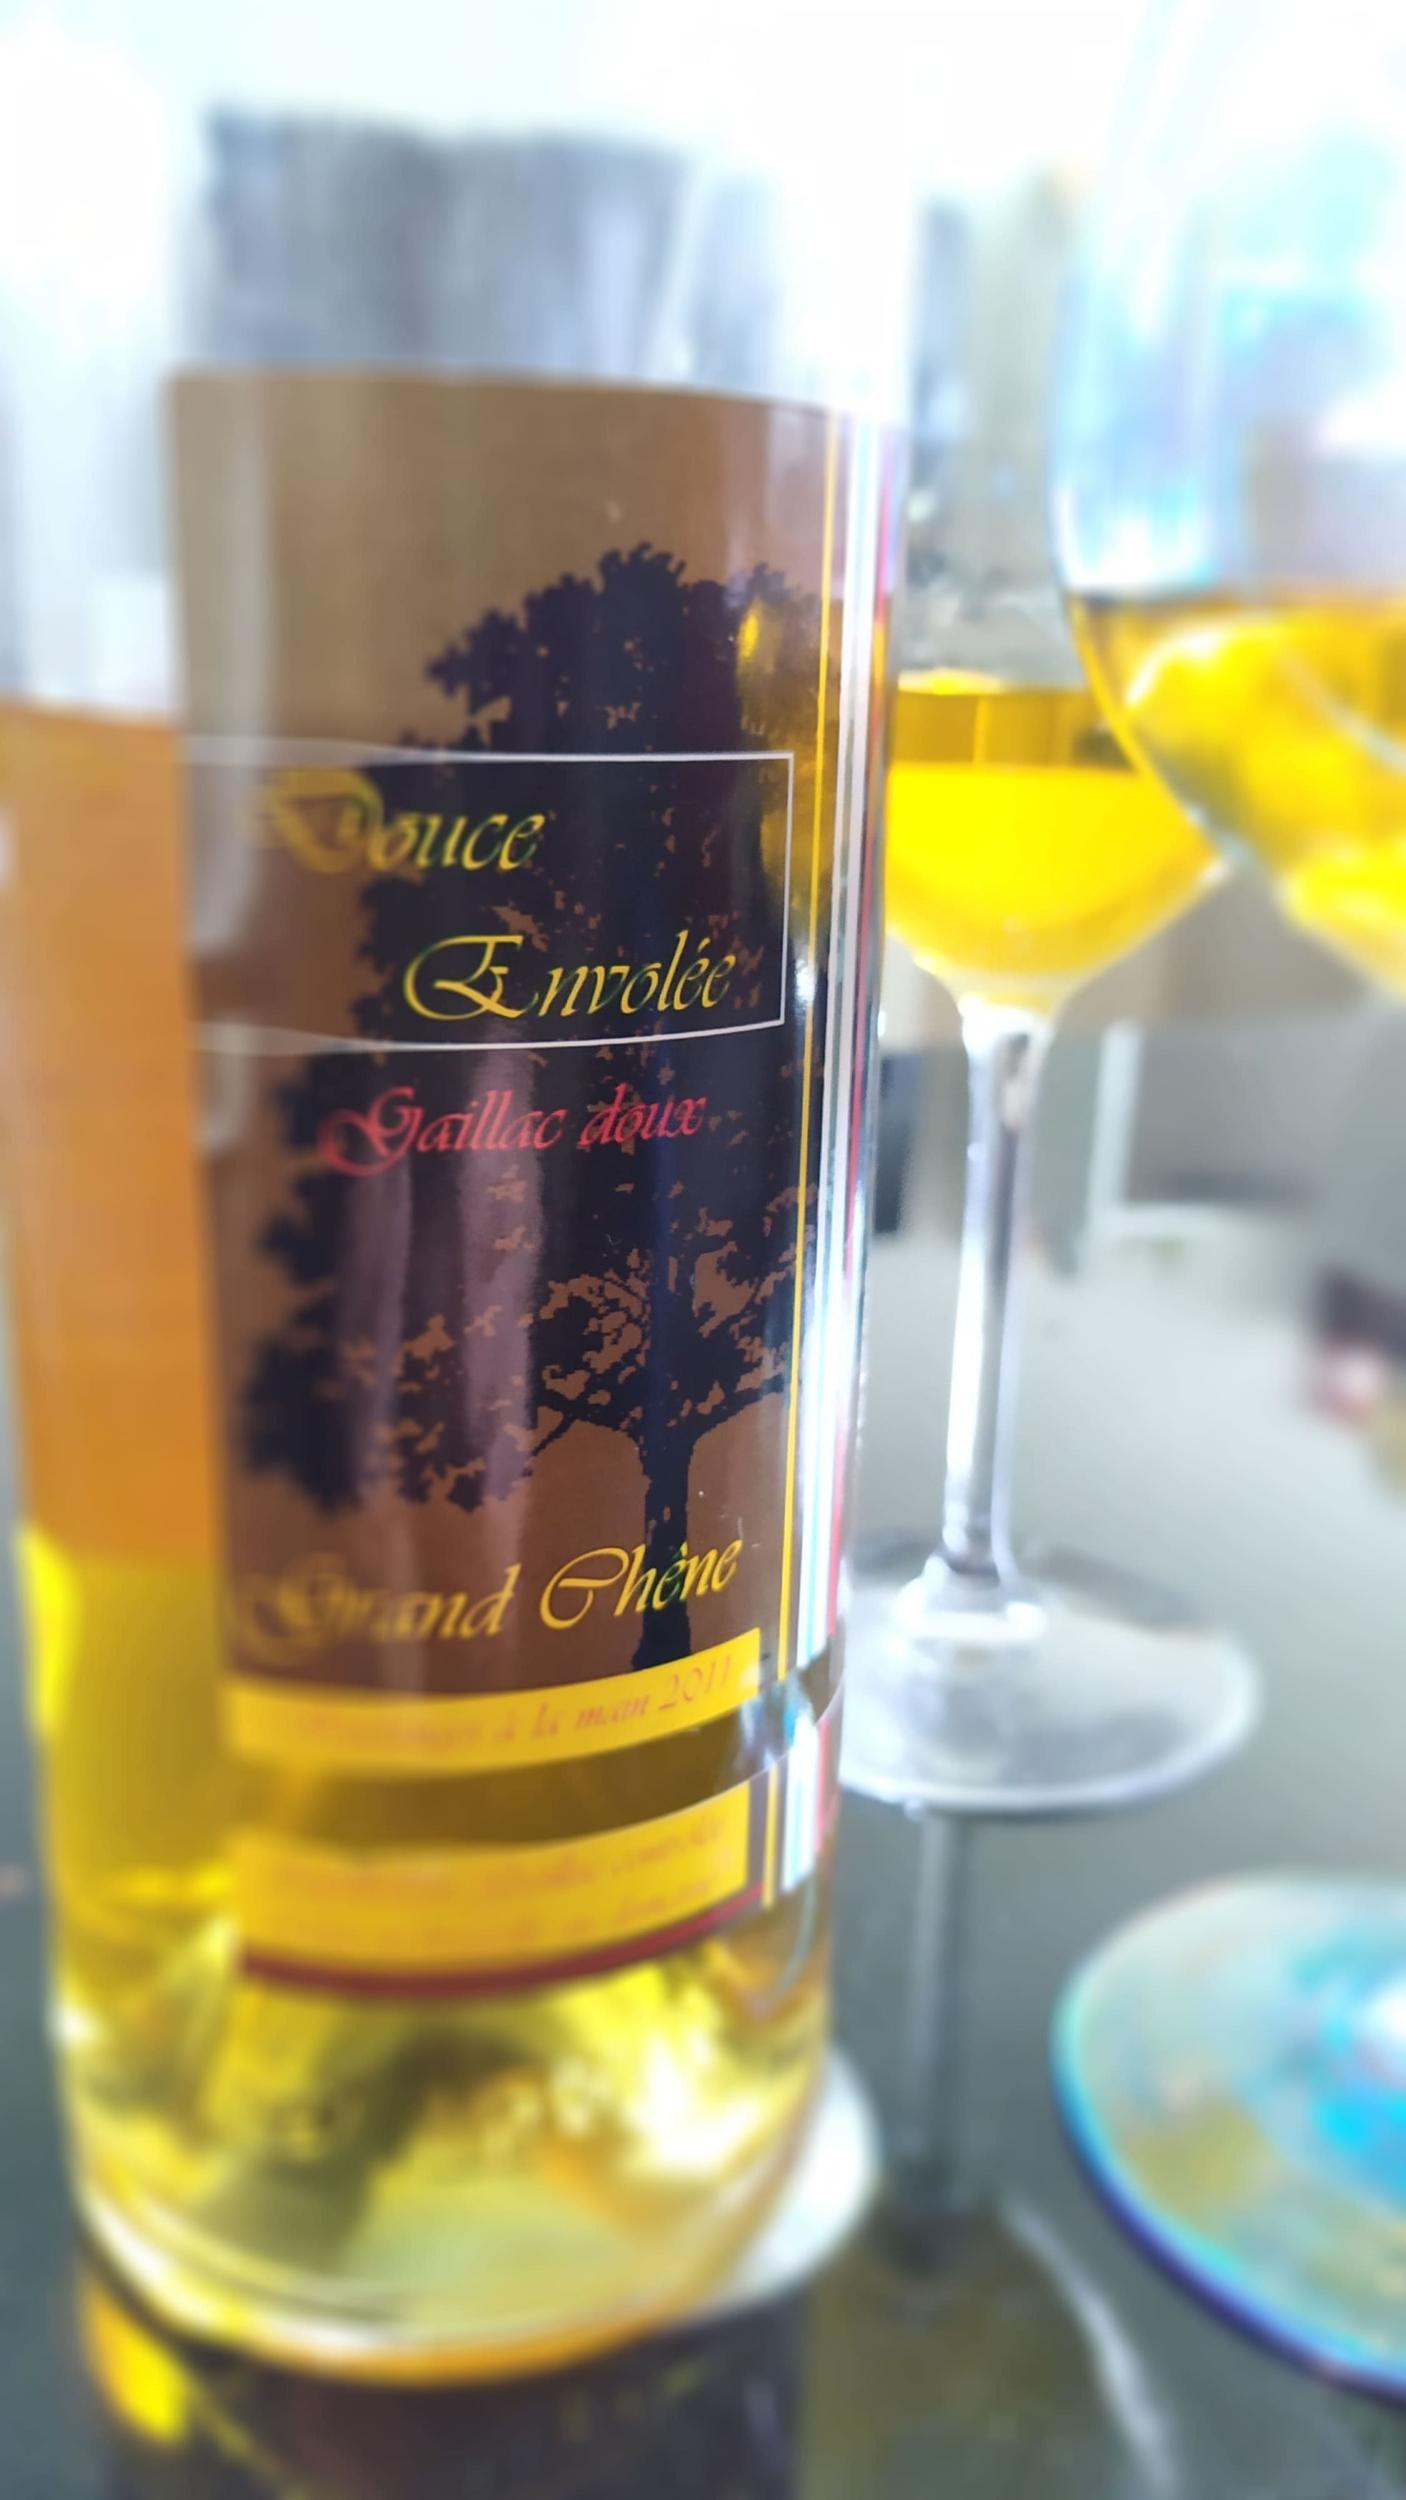 Domaine Grand Chêne Douce Envolée Gaillac AOP 2011 Blanc 3x75cl